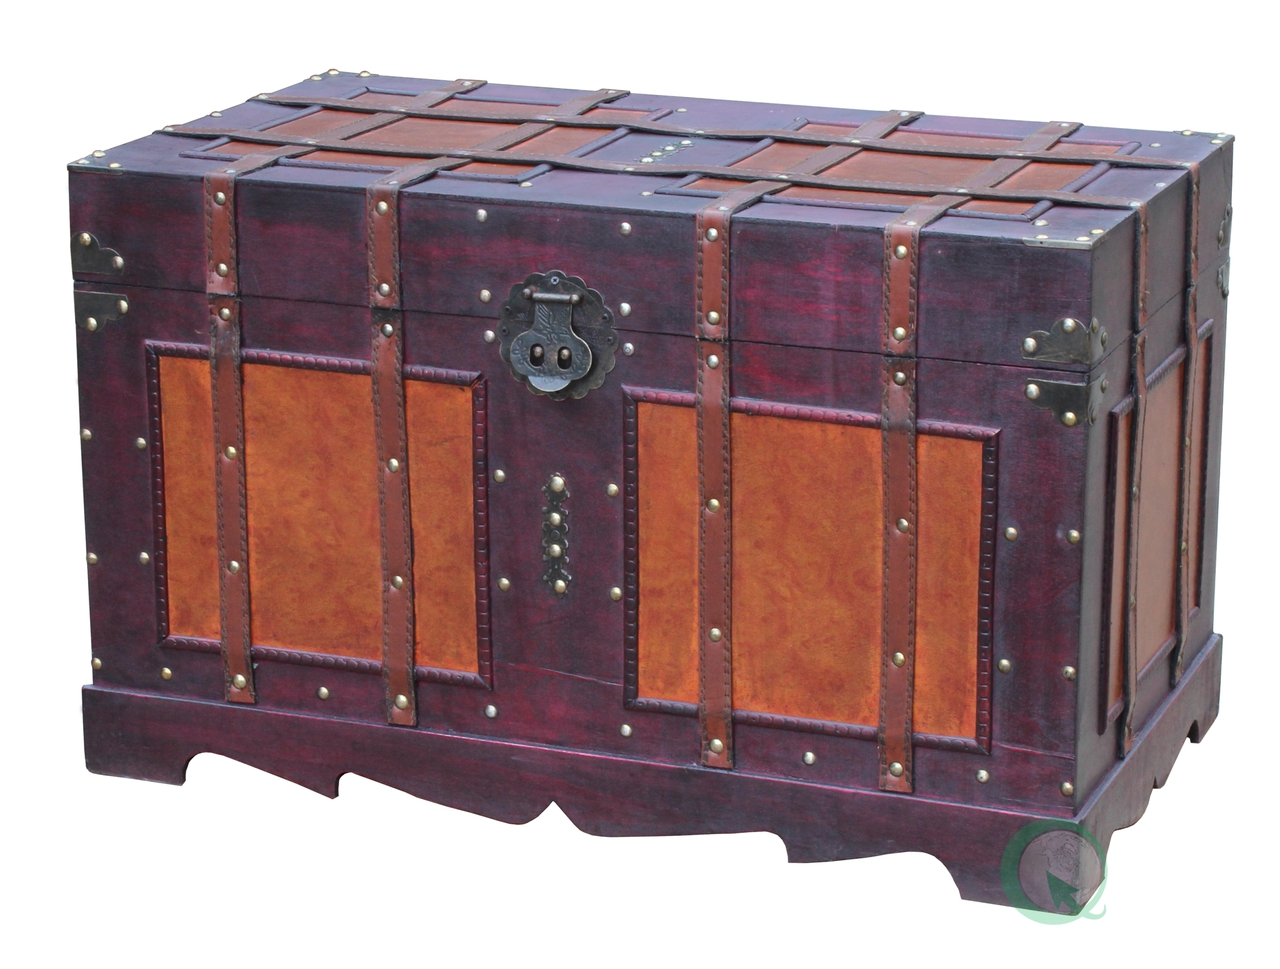 New Large Antique Style Steamer Trunk Decorative Storage Box QI003318L